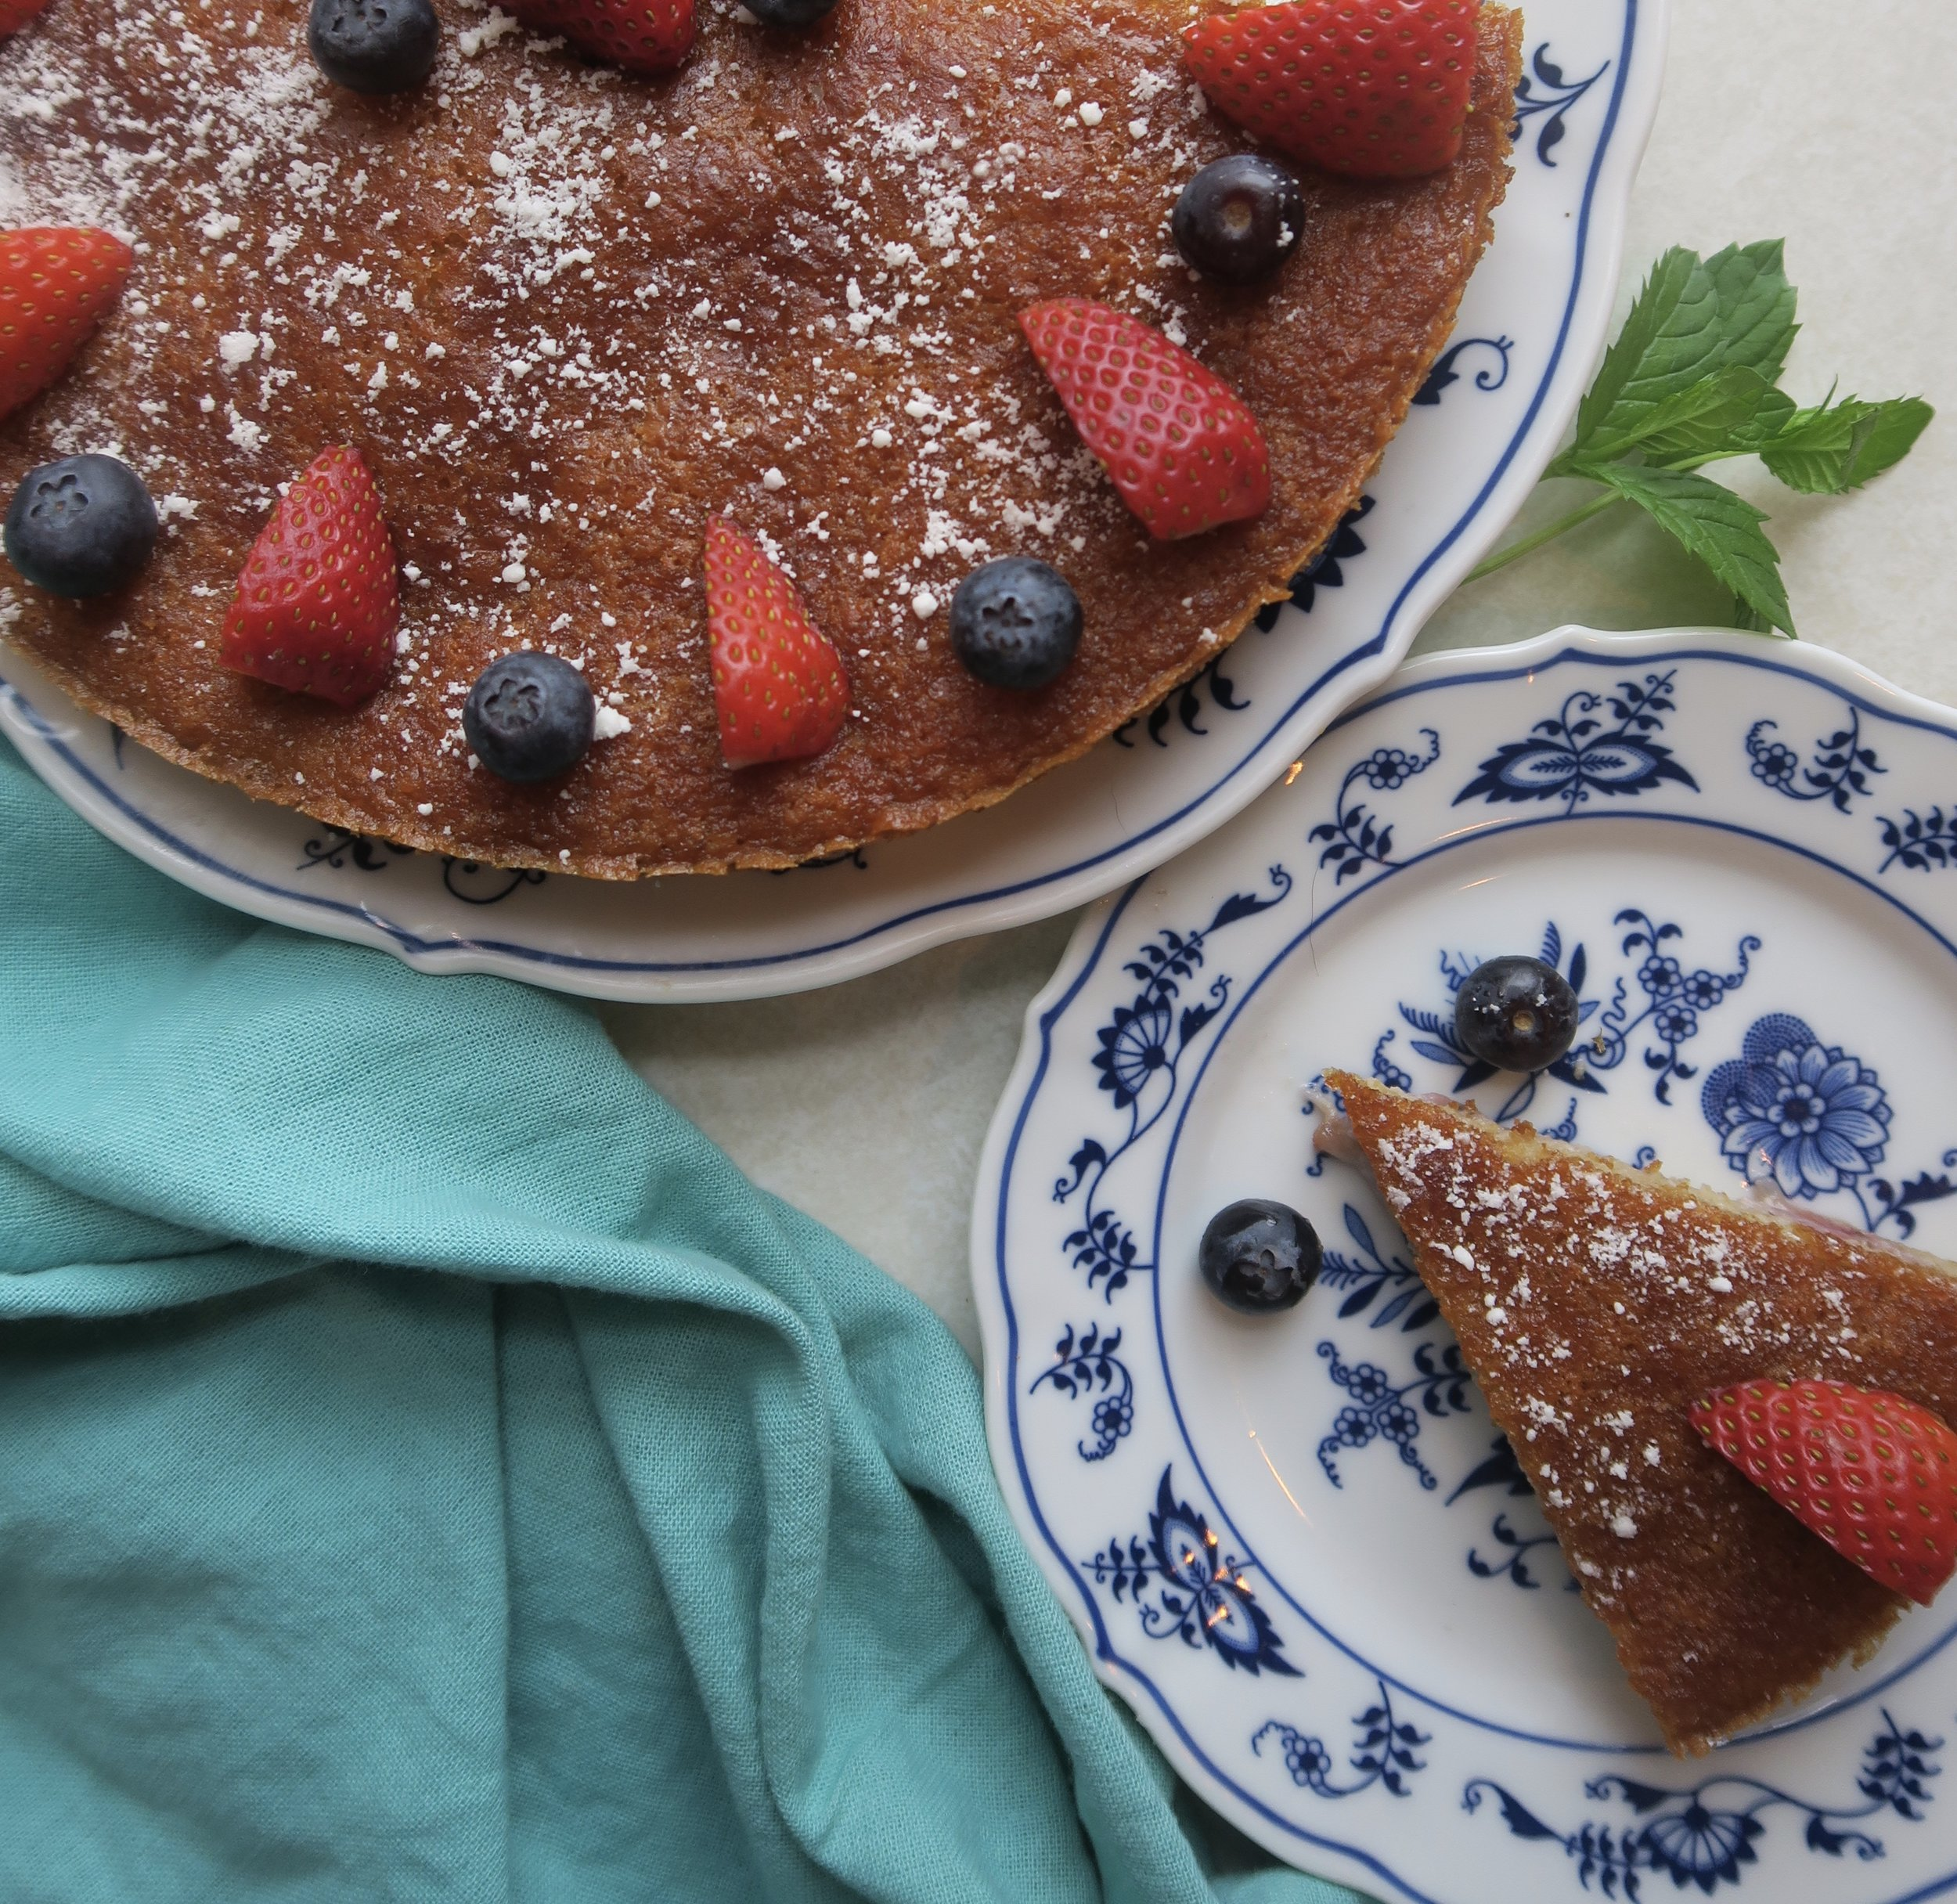 strawberry almond cake, paleo cake, paleo dessert, Lake Superior kitchen, Duluth food